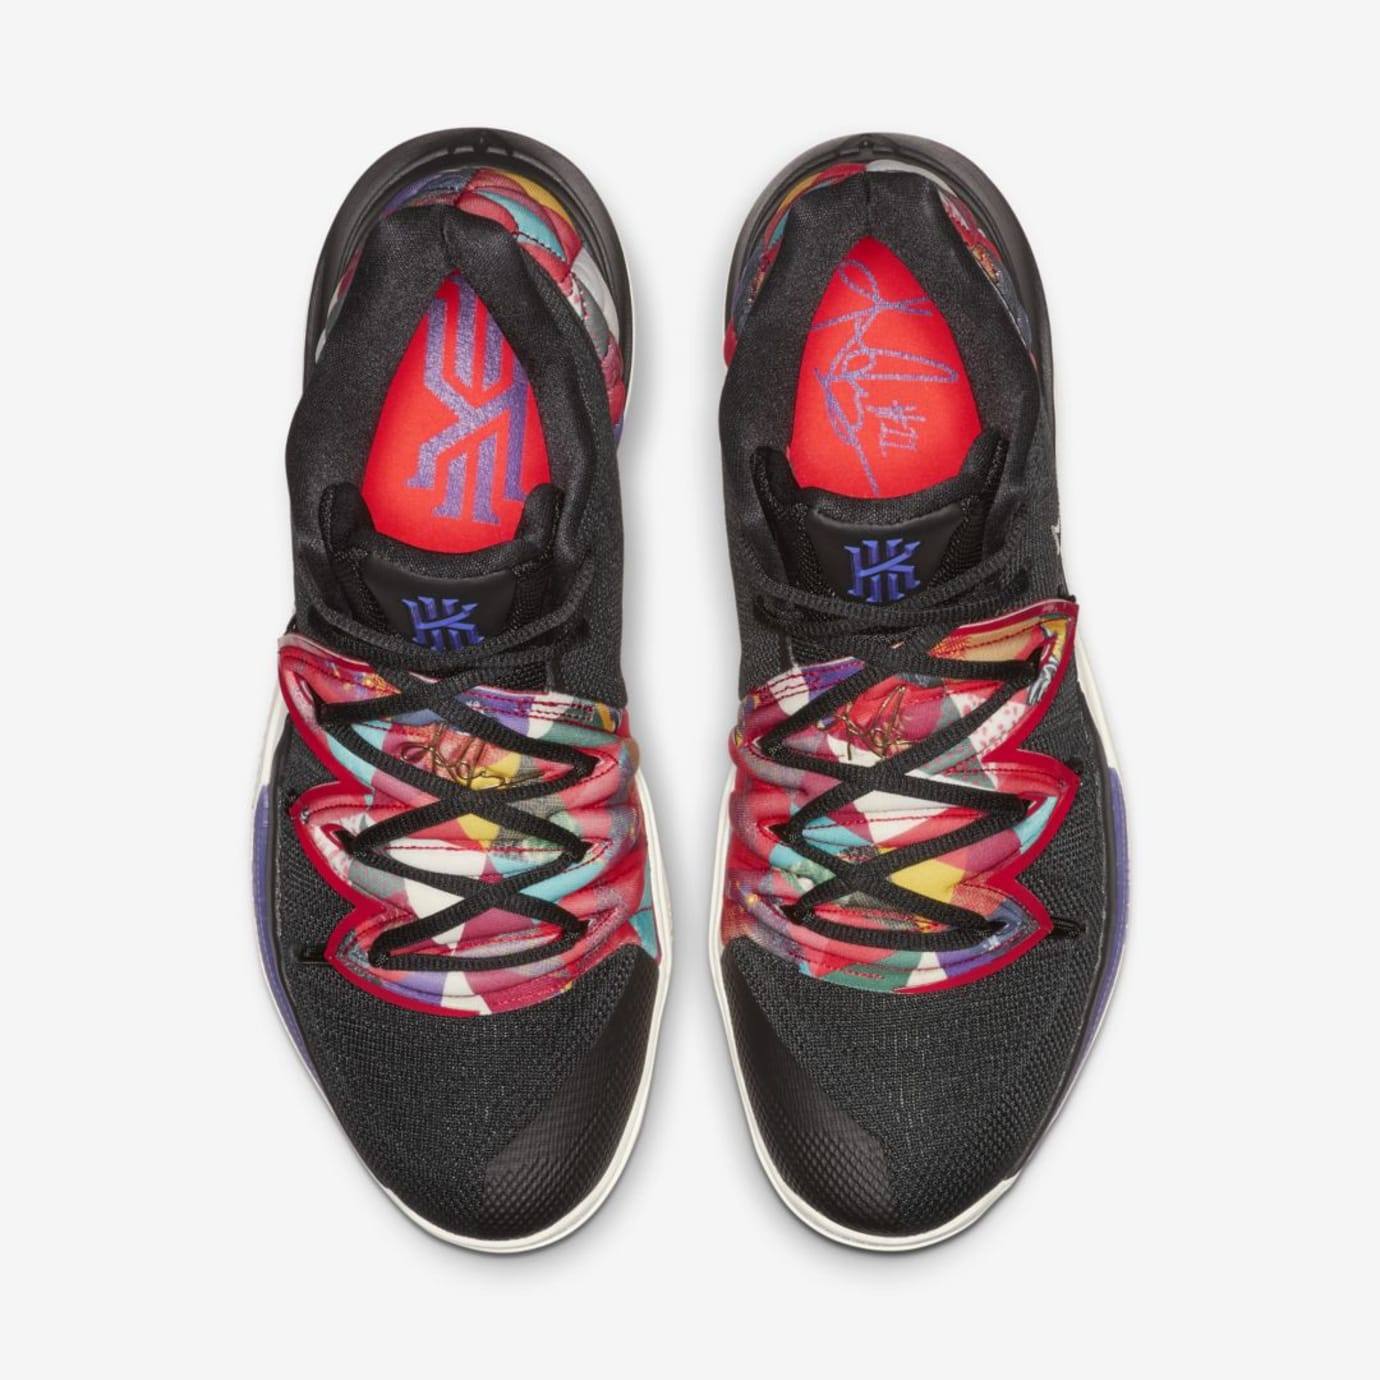 048d8fb0ba3 Nike Kyrie 5 'Black/Multi-Color' Release Date | Premier Kicks